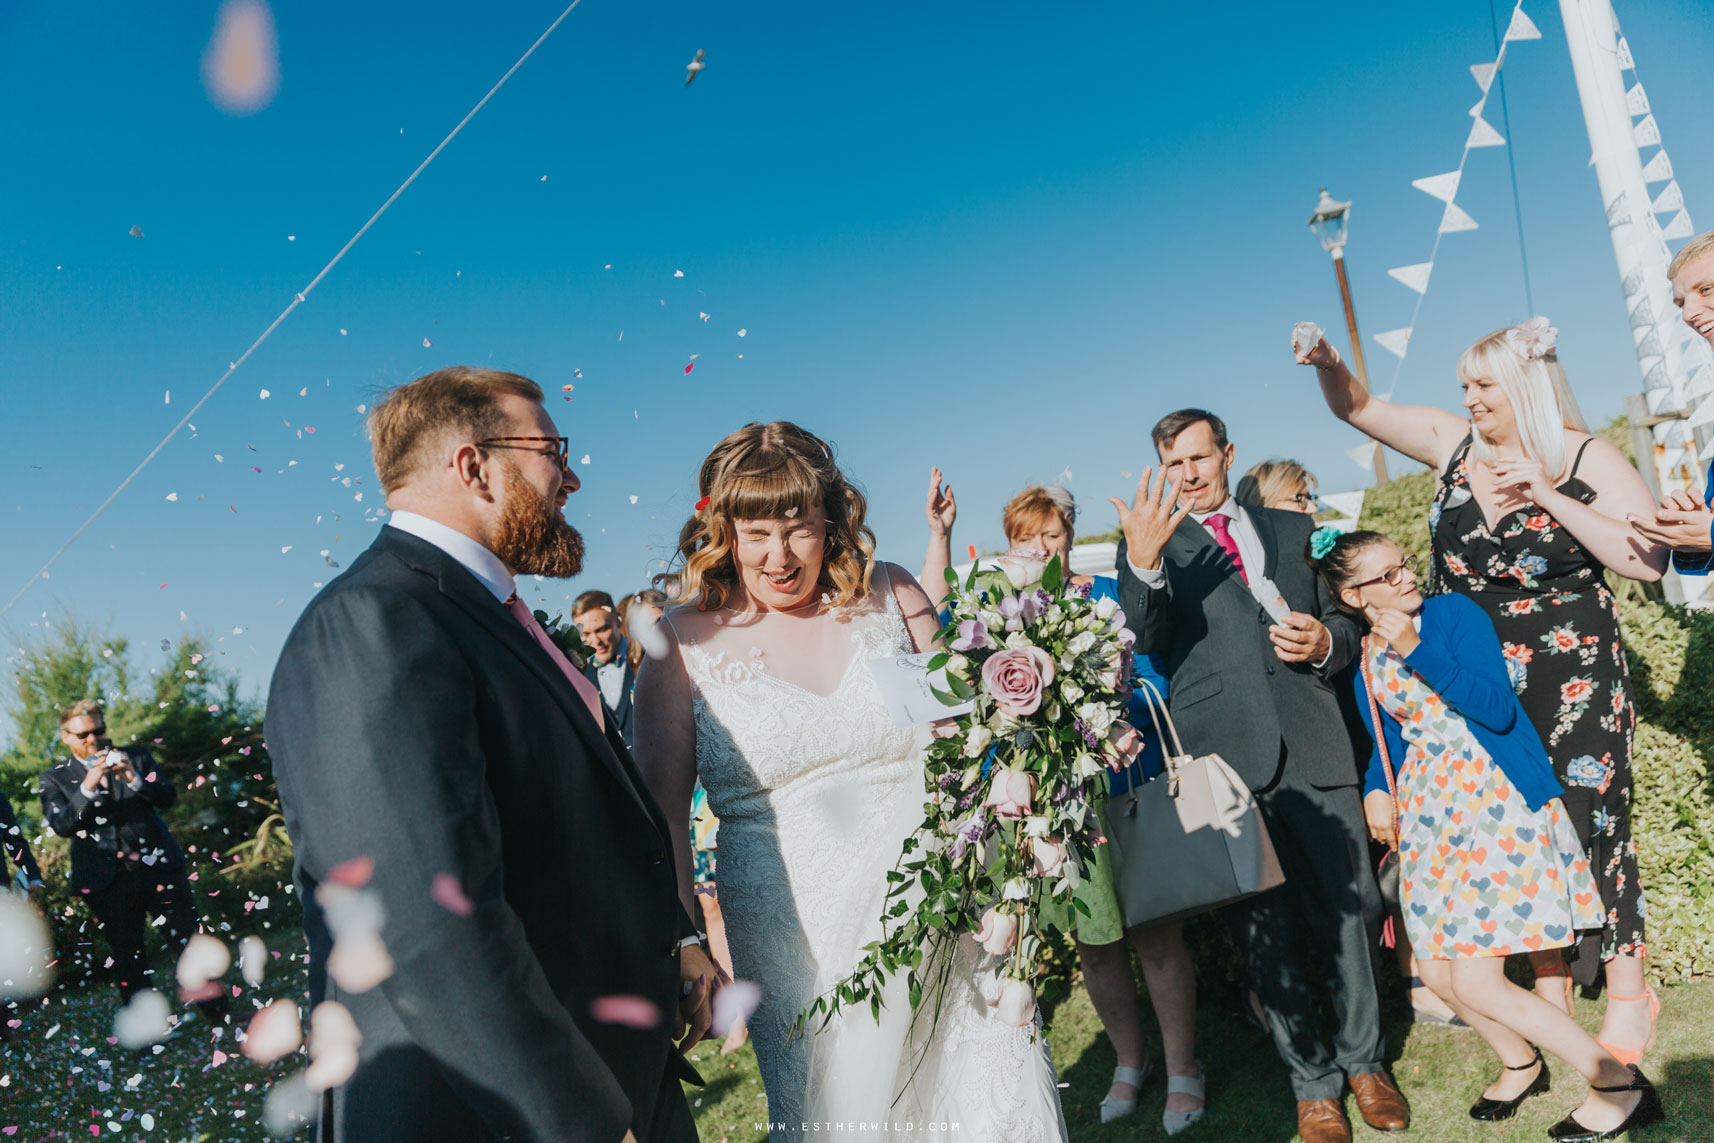 Cromer_Wedding_Beach_Outdoor_Ceremony_Norfolk_North_Lodge_Registry_Office_Rocket_House_Cafe_Cromer_Pier_IMG_4138_IMGL8163.jpg